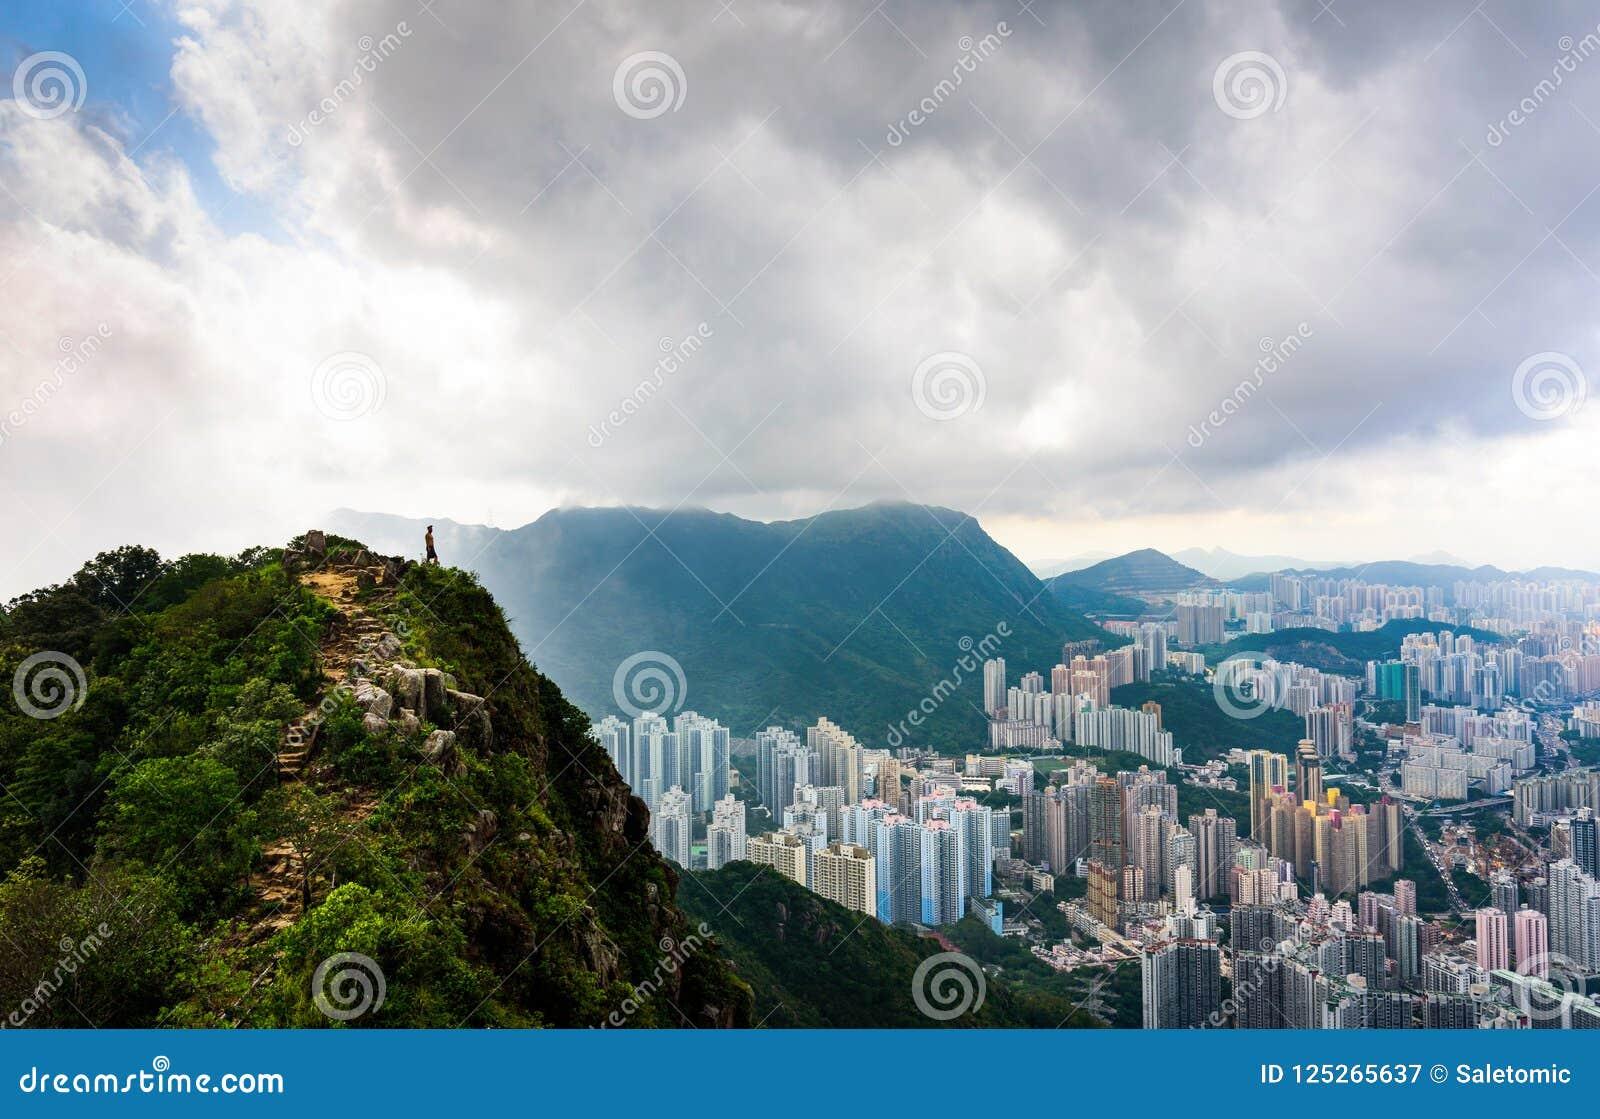 Man enjoying fogy Hong Kong view from the Lion rock